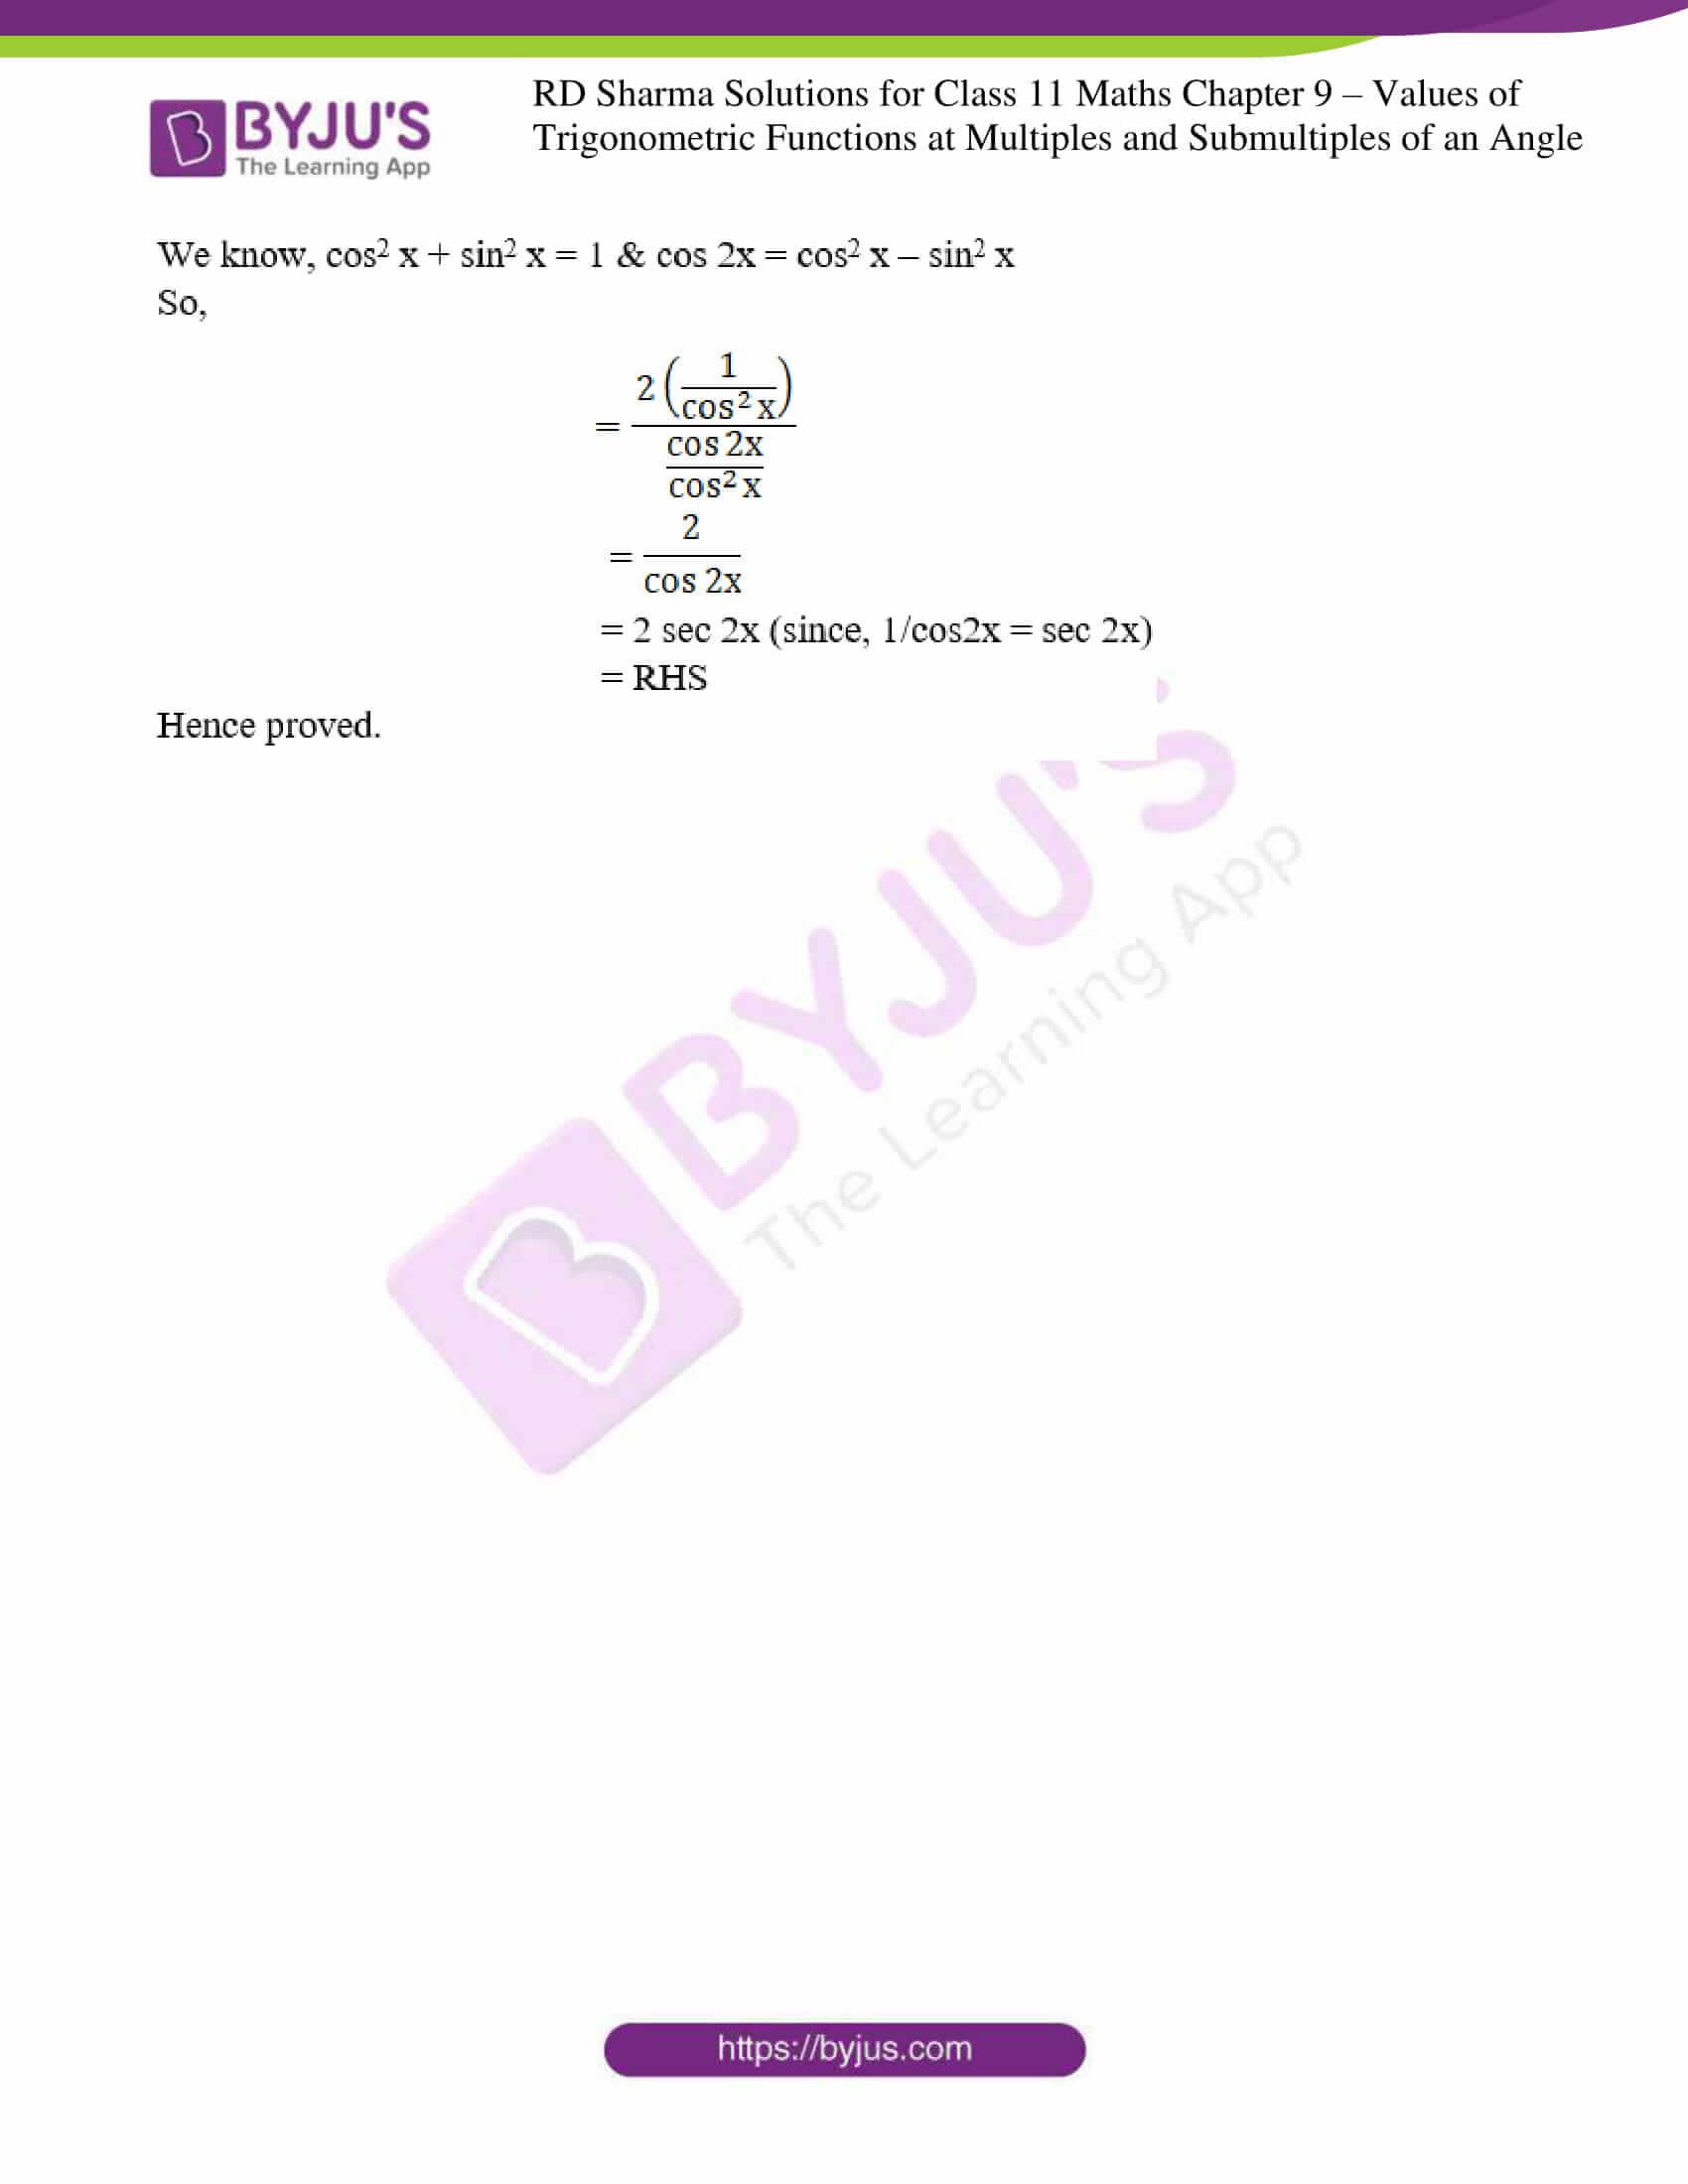 rd sharma class 11 maths ch 9 ex 1 15